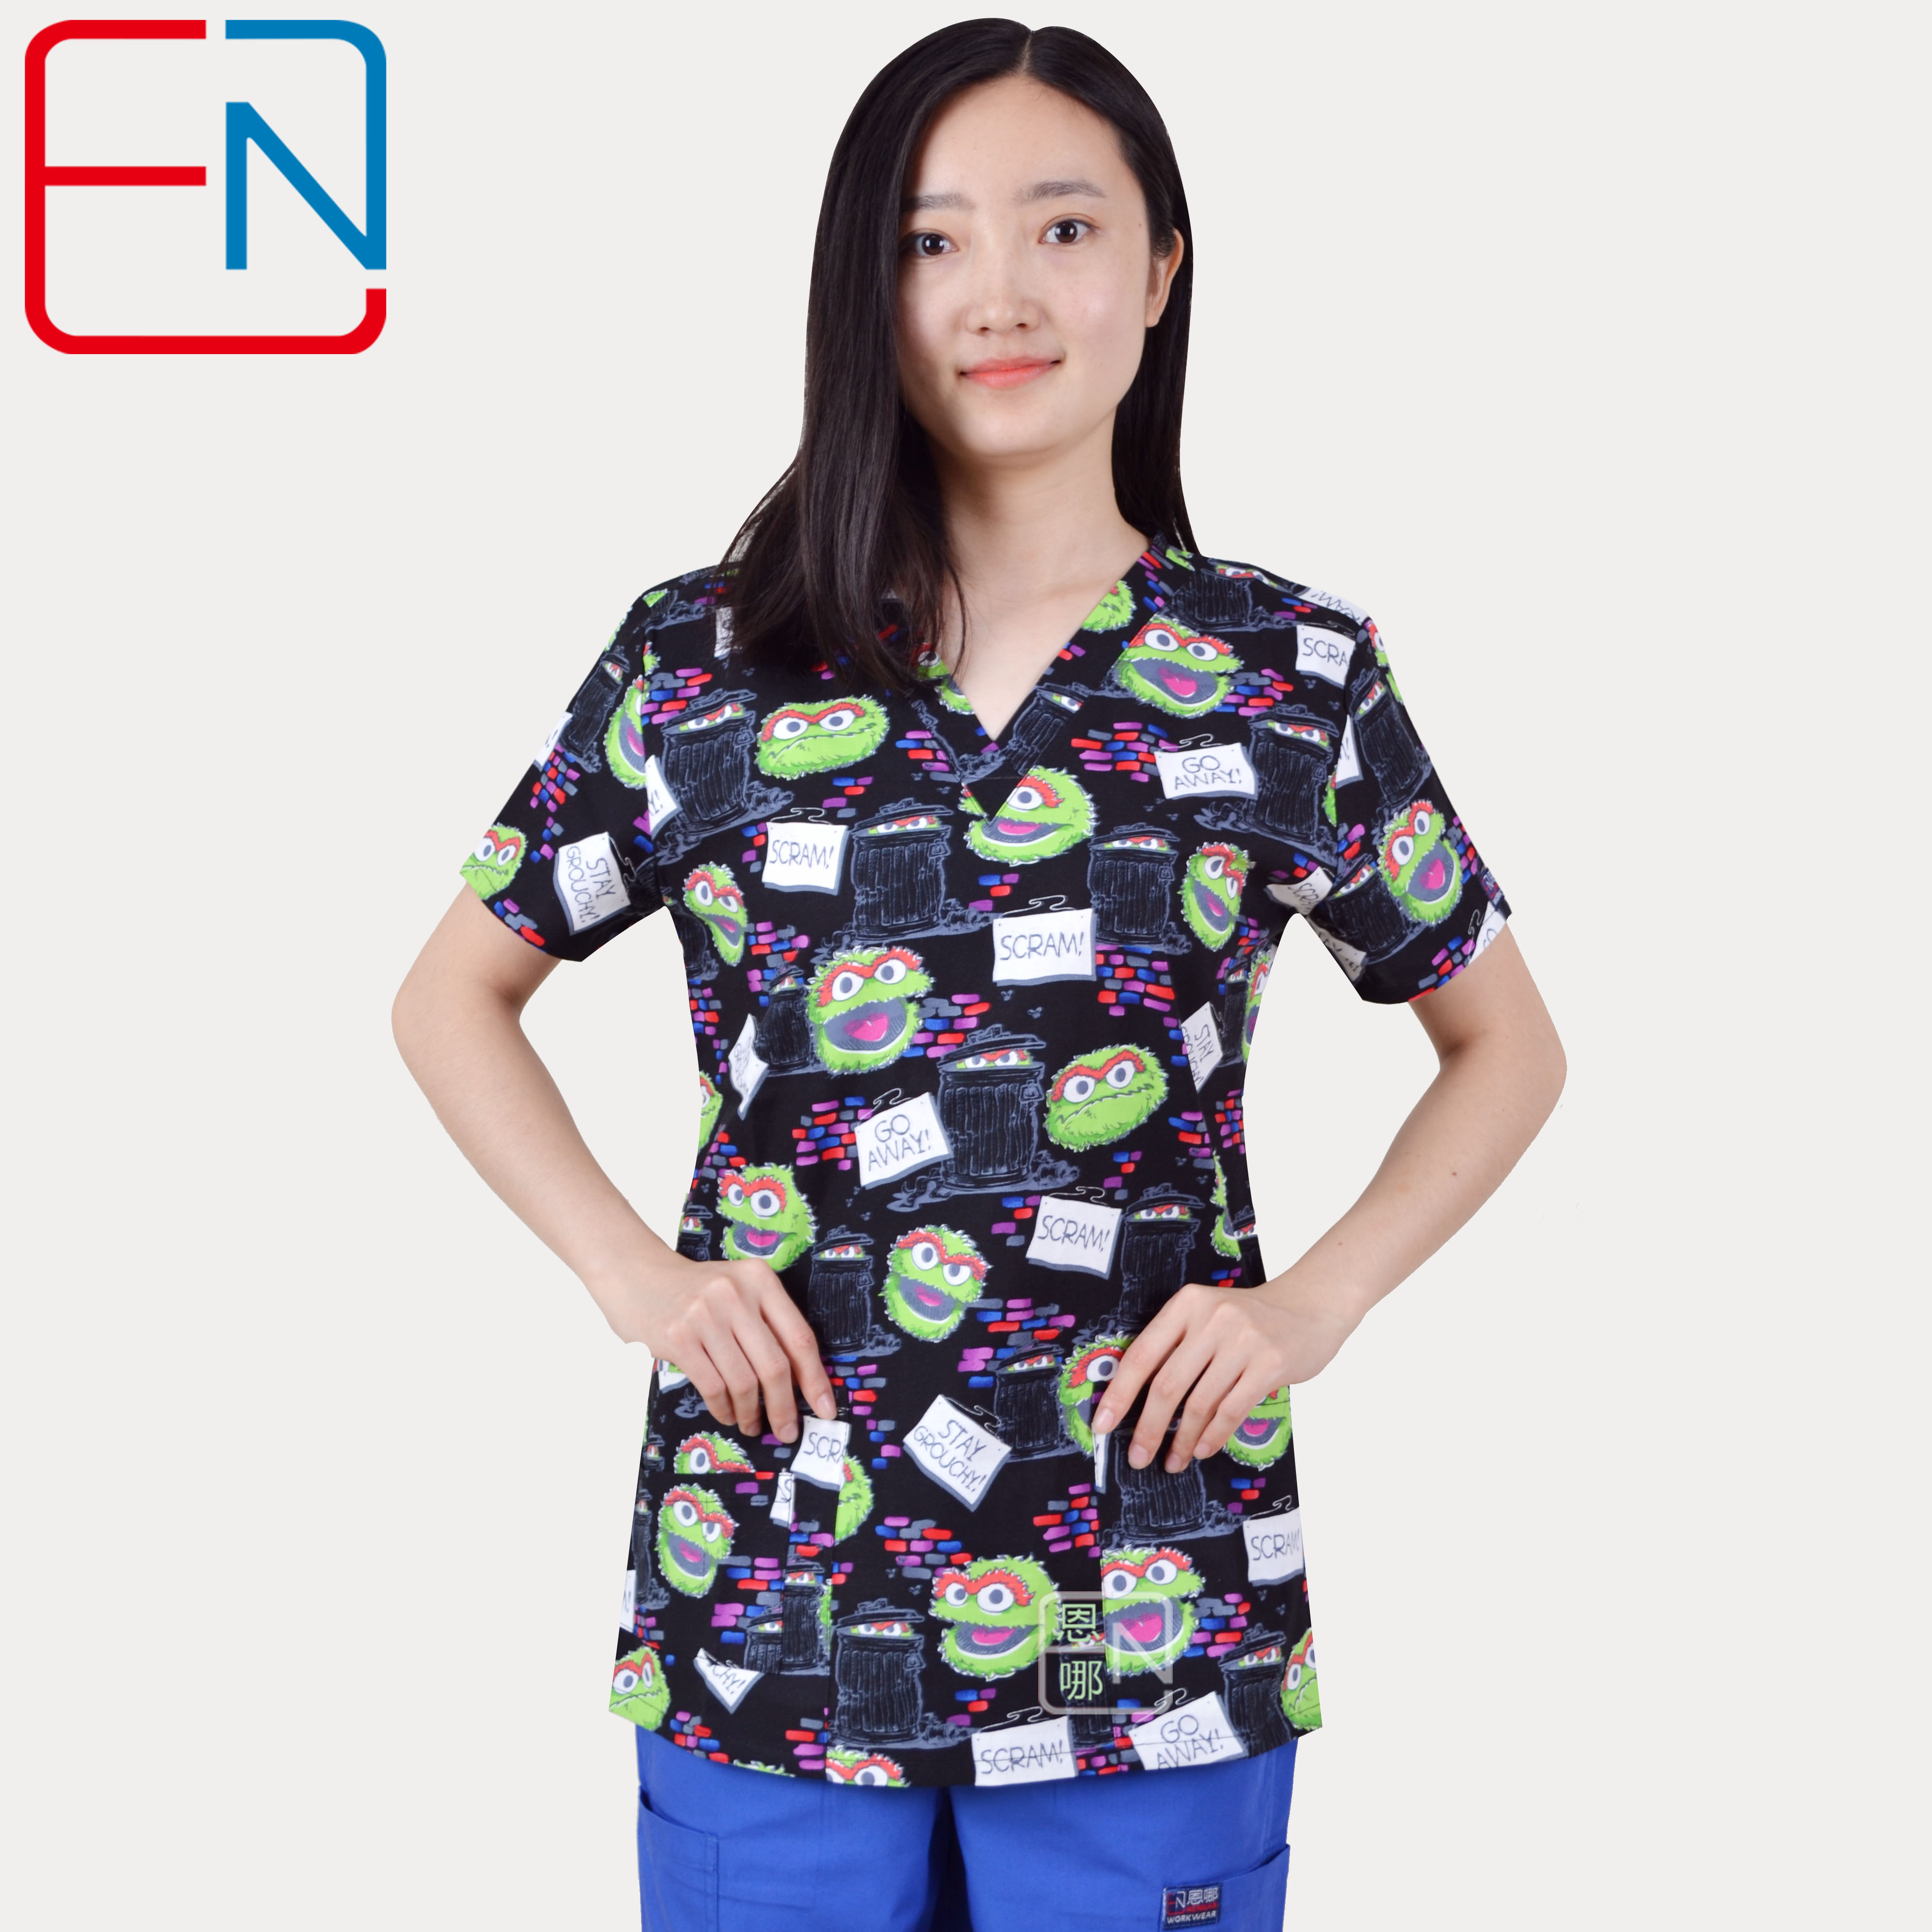 Hennar Medical Uniforms Women Scrub Top V-Neck Black Print 100% Cotton Hospital Clinical Surgical Scrubs Top For Women XXS-XXXL